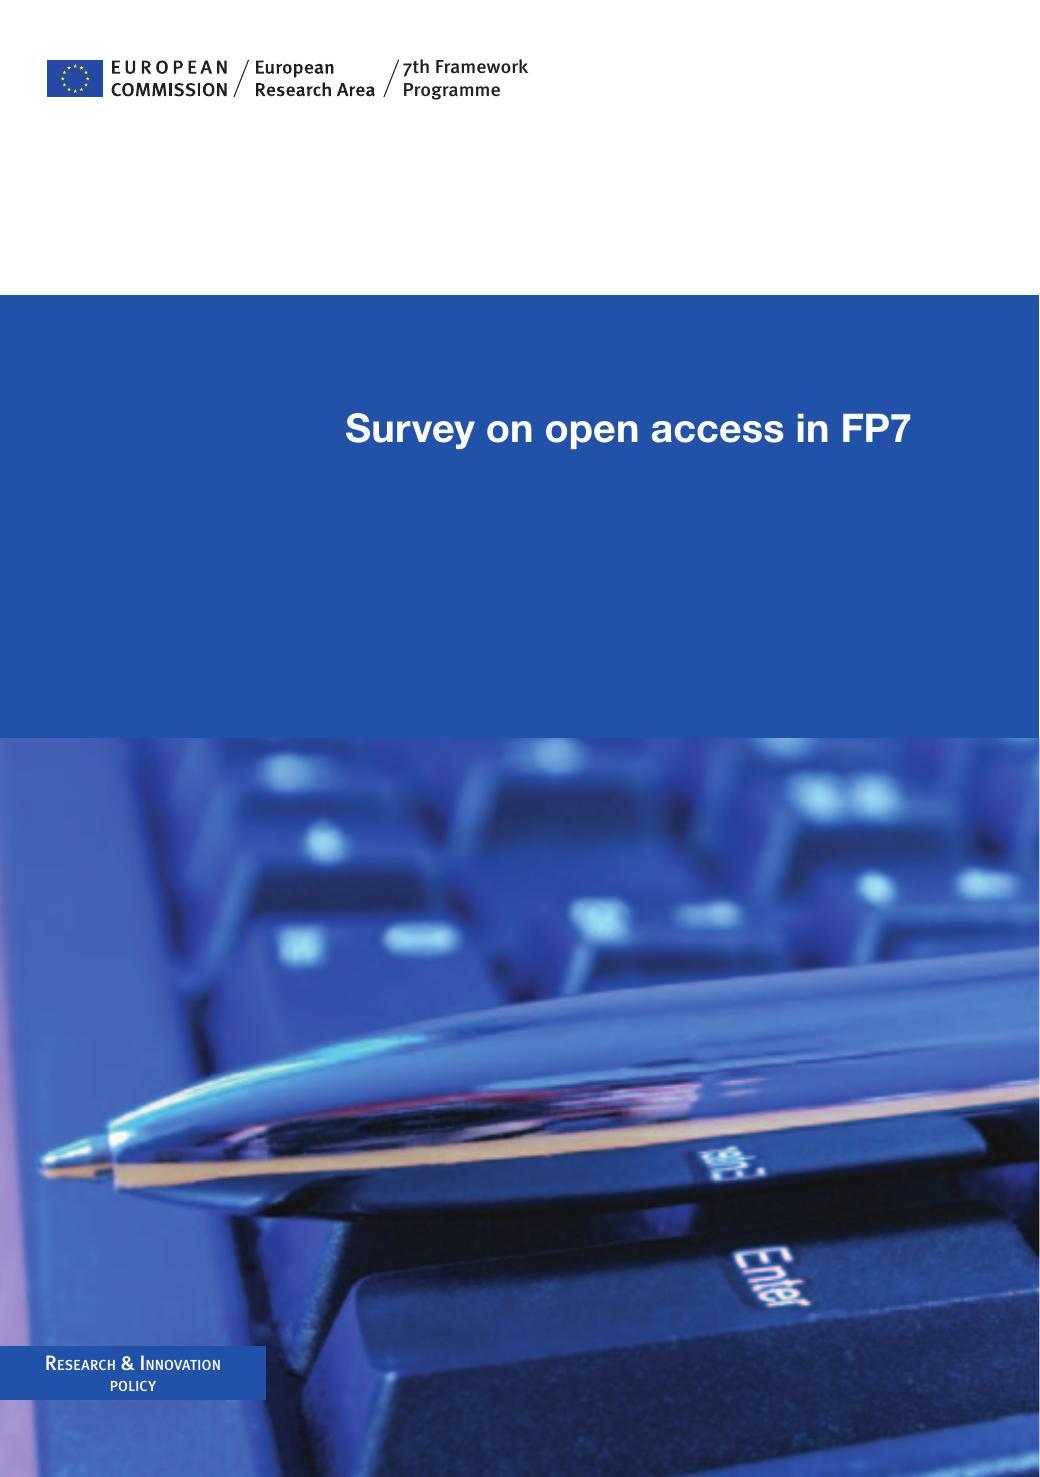 Survey on open access in FP7